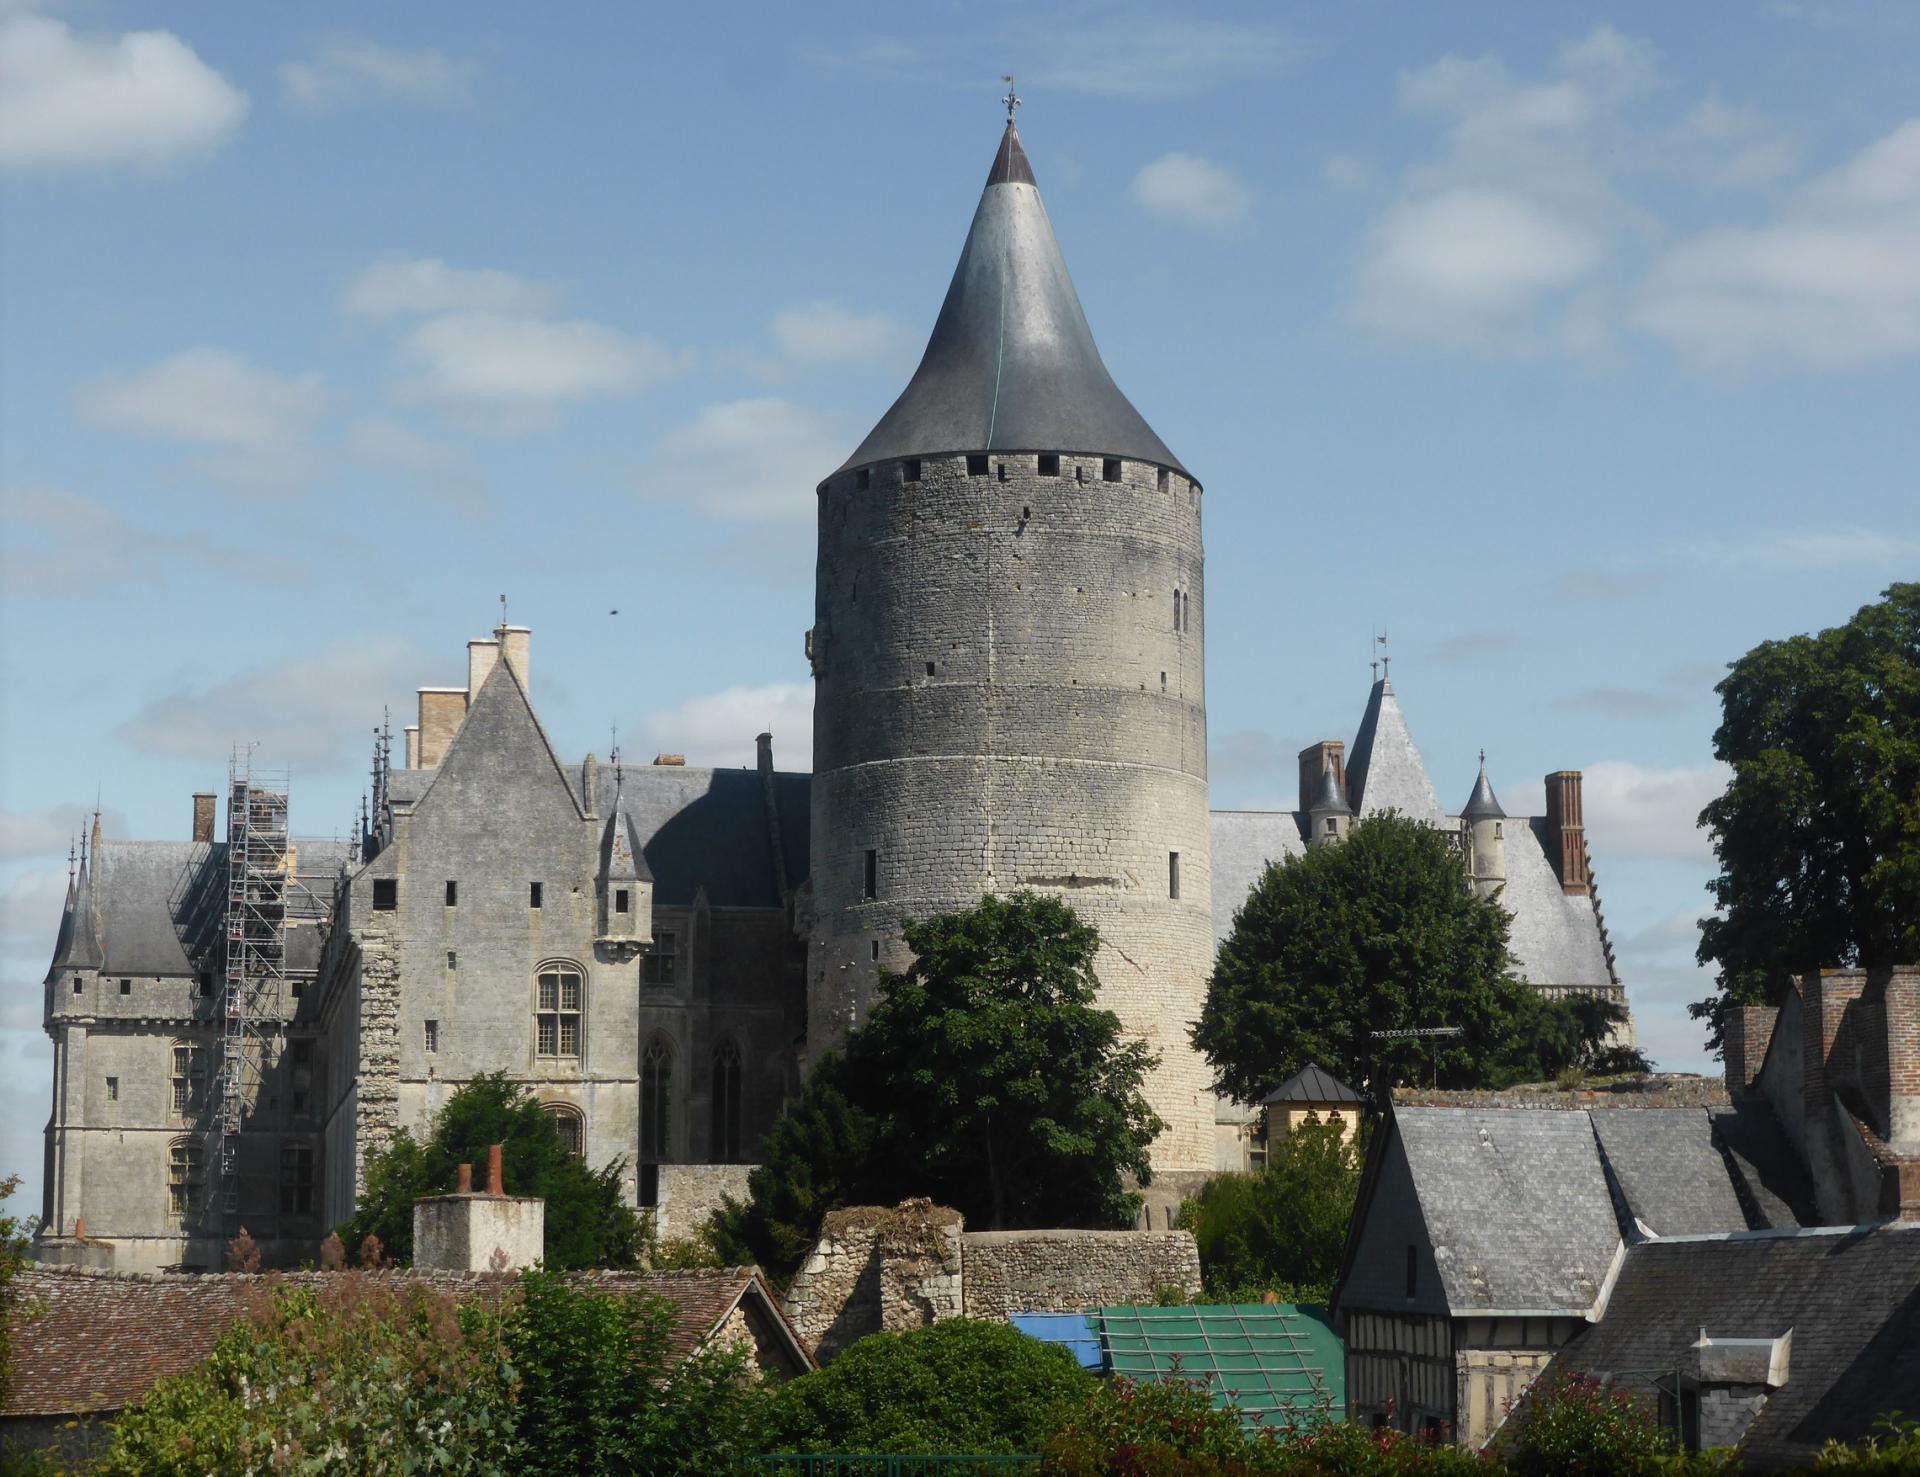 Châteaudun, le château et son donjon, XIe siècle, cl. Ph. Cachau